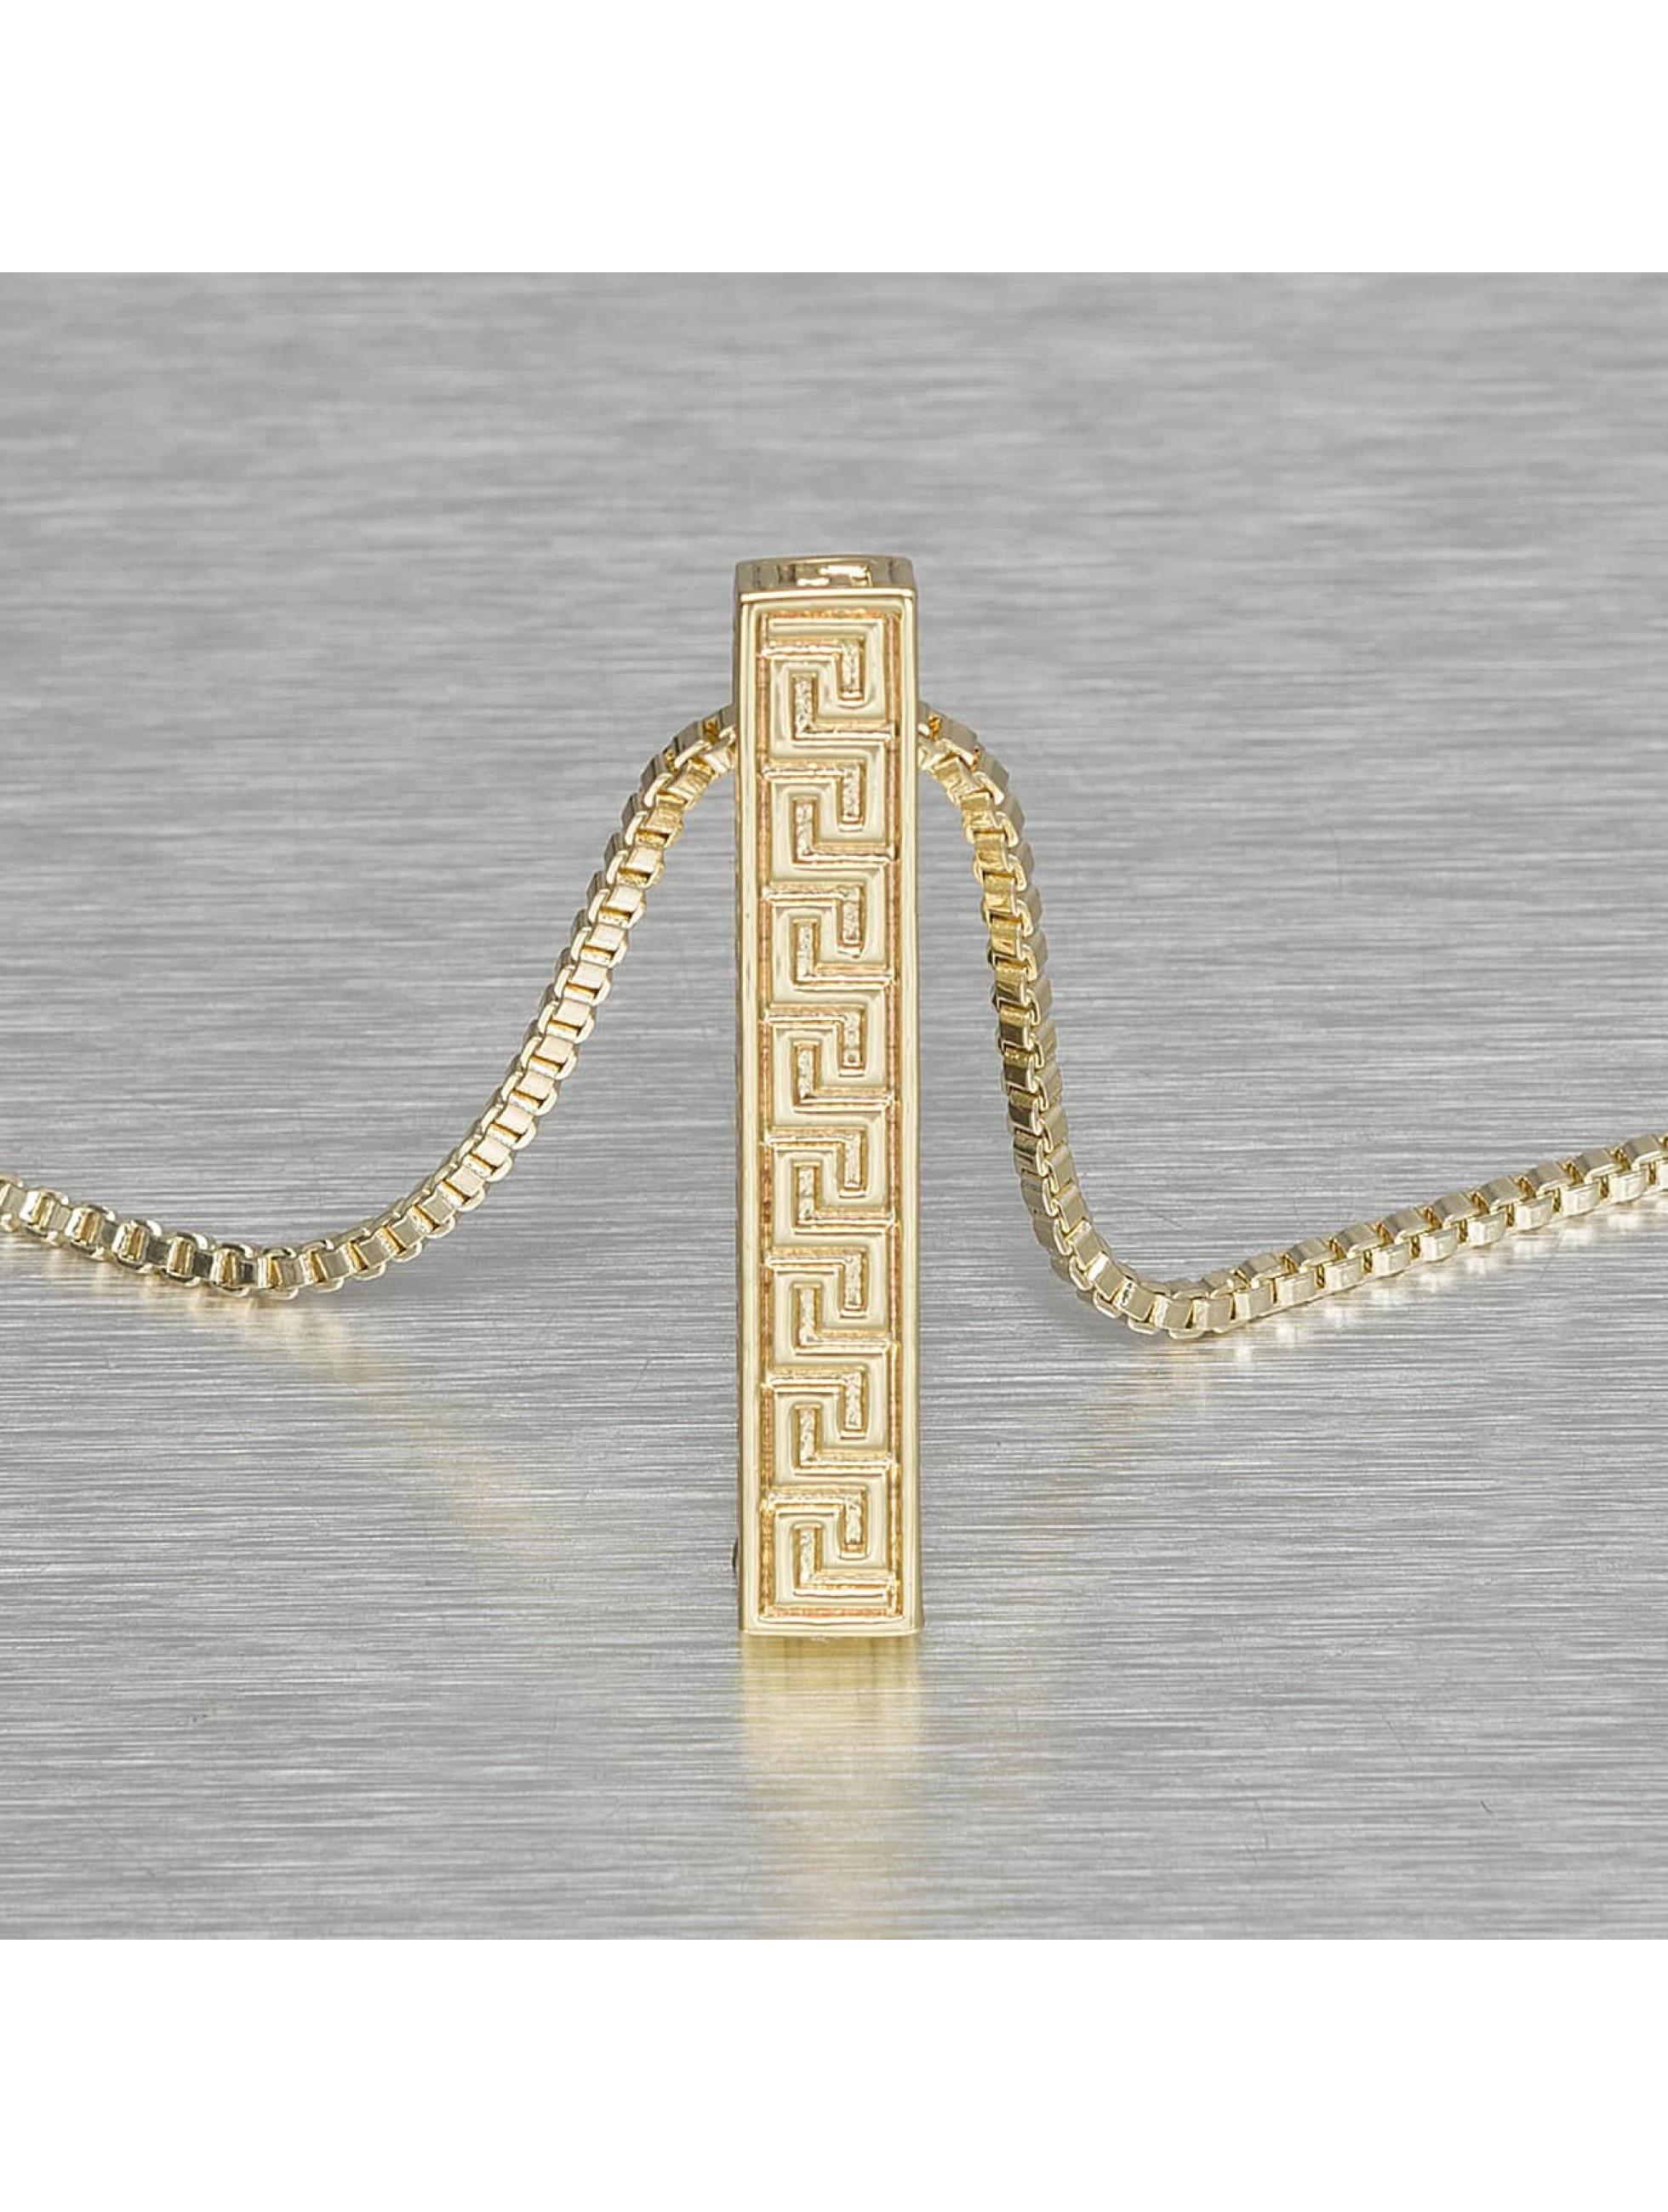 KING ICE Collier Greek Key Pillar or